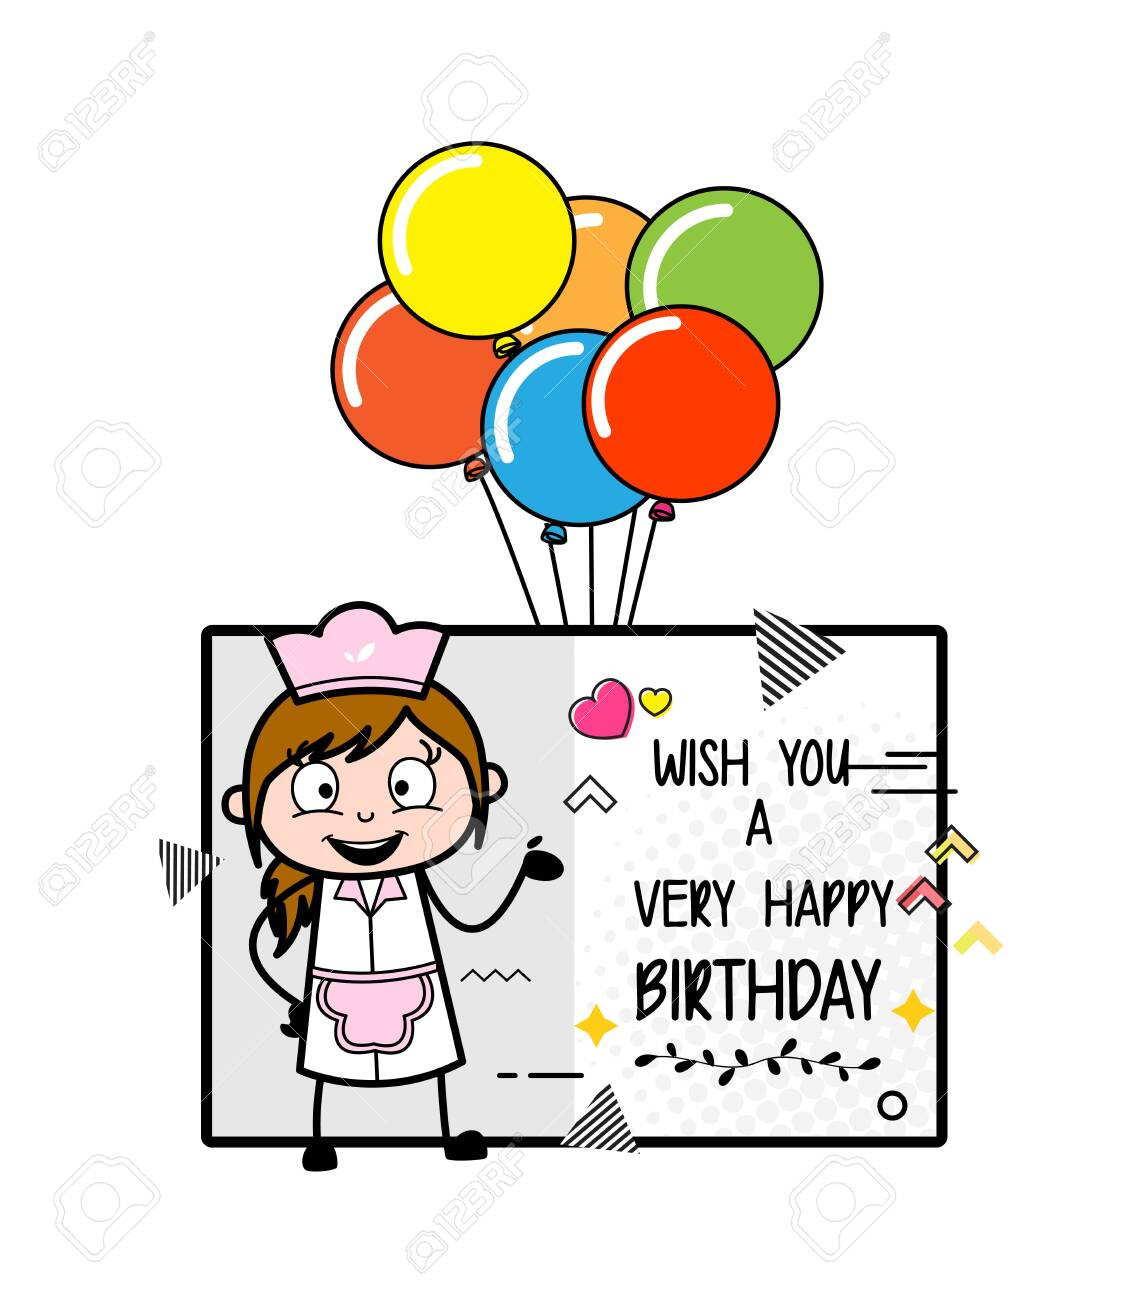 Presenting Birthday Wish Greeting - Retro Cartoon Waitress Female Chef Vector Illustration - 128508350